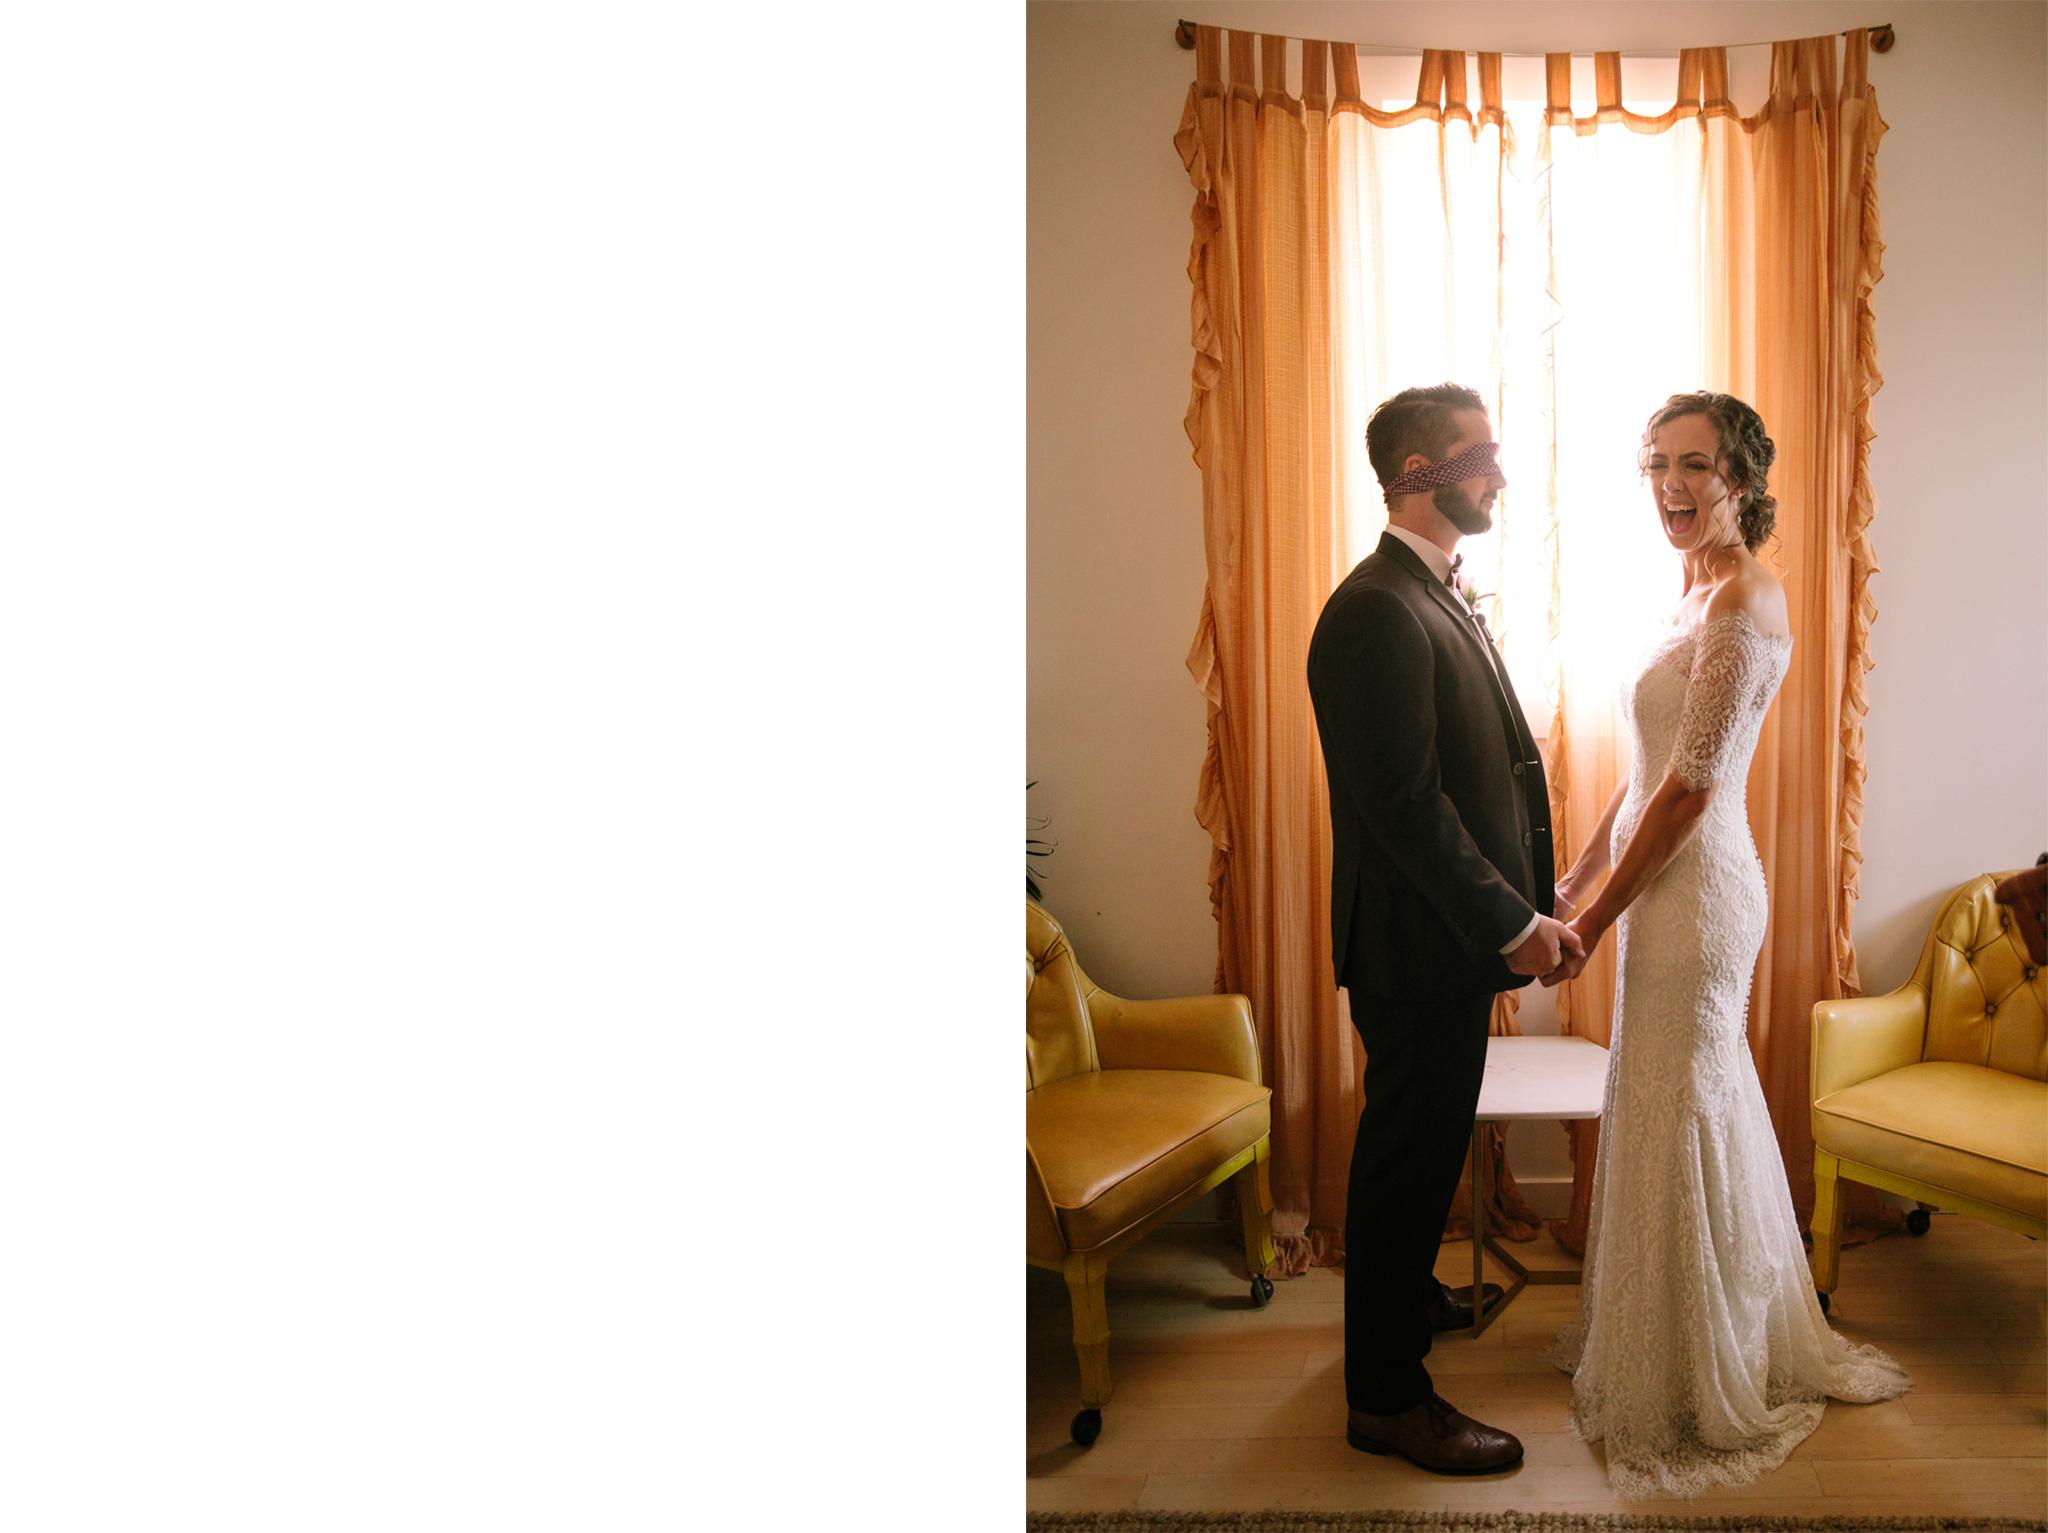 LJ-Ruby-Street-Los-Angeles-County-Wedding-Photography-Teaser-7.jpg